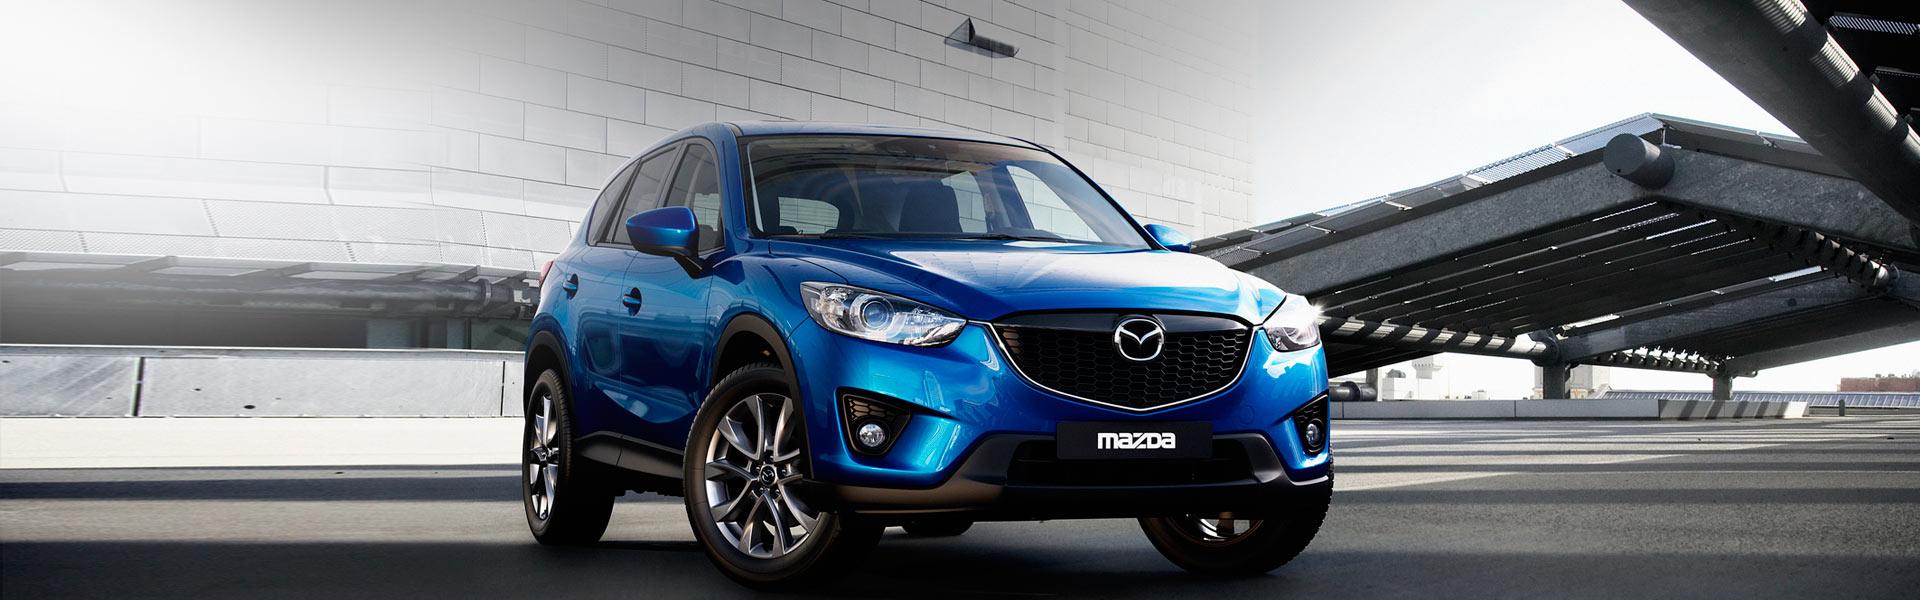 Сцепление на Mazda